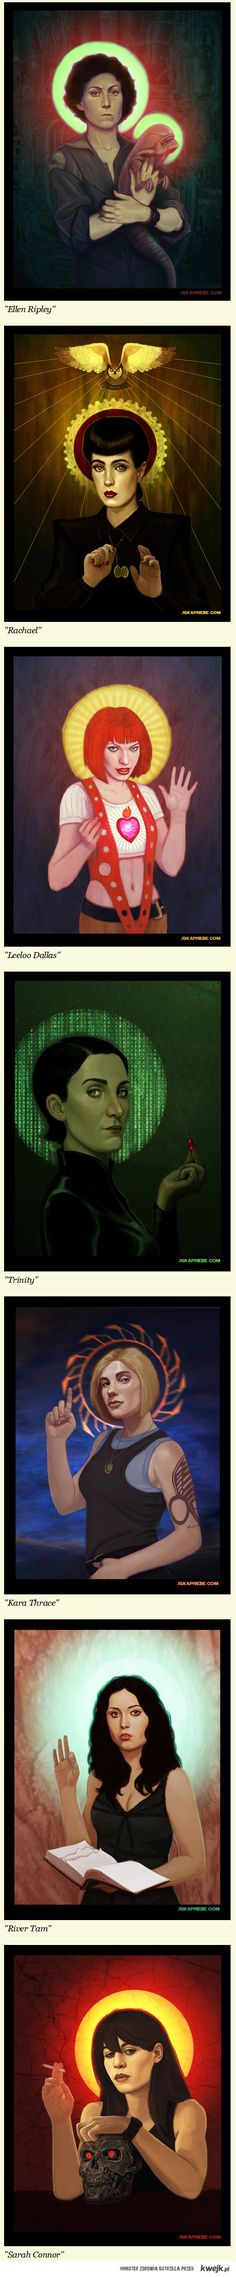 The female saints of Sci-fi